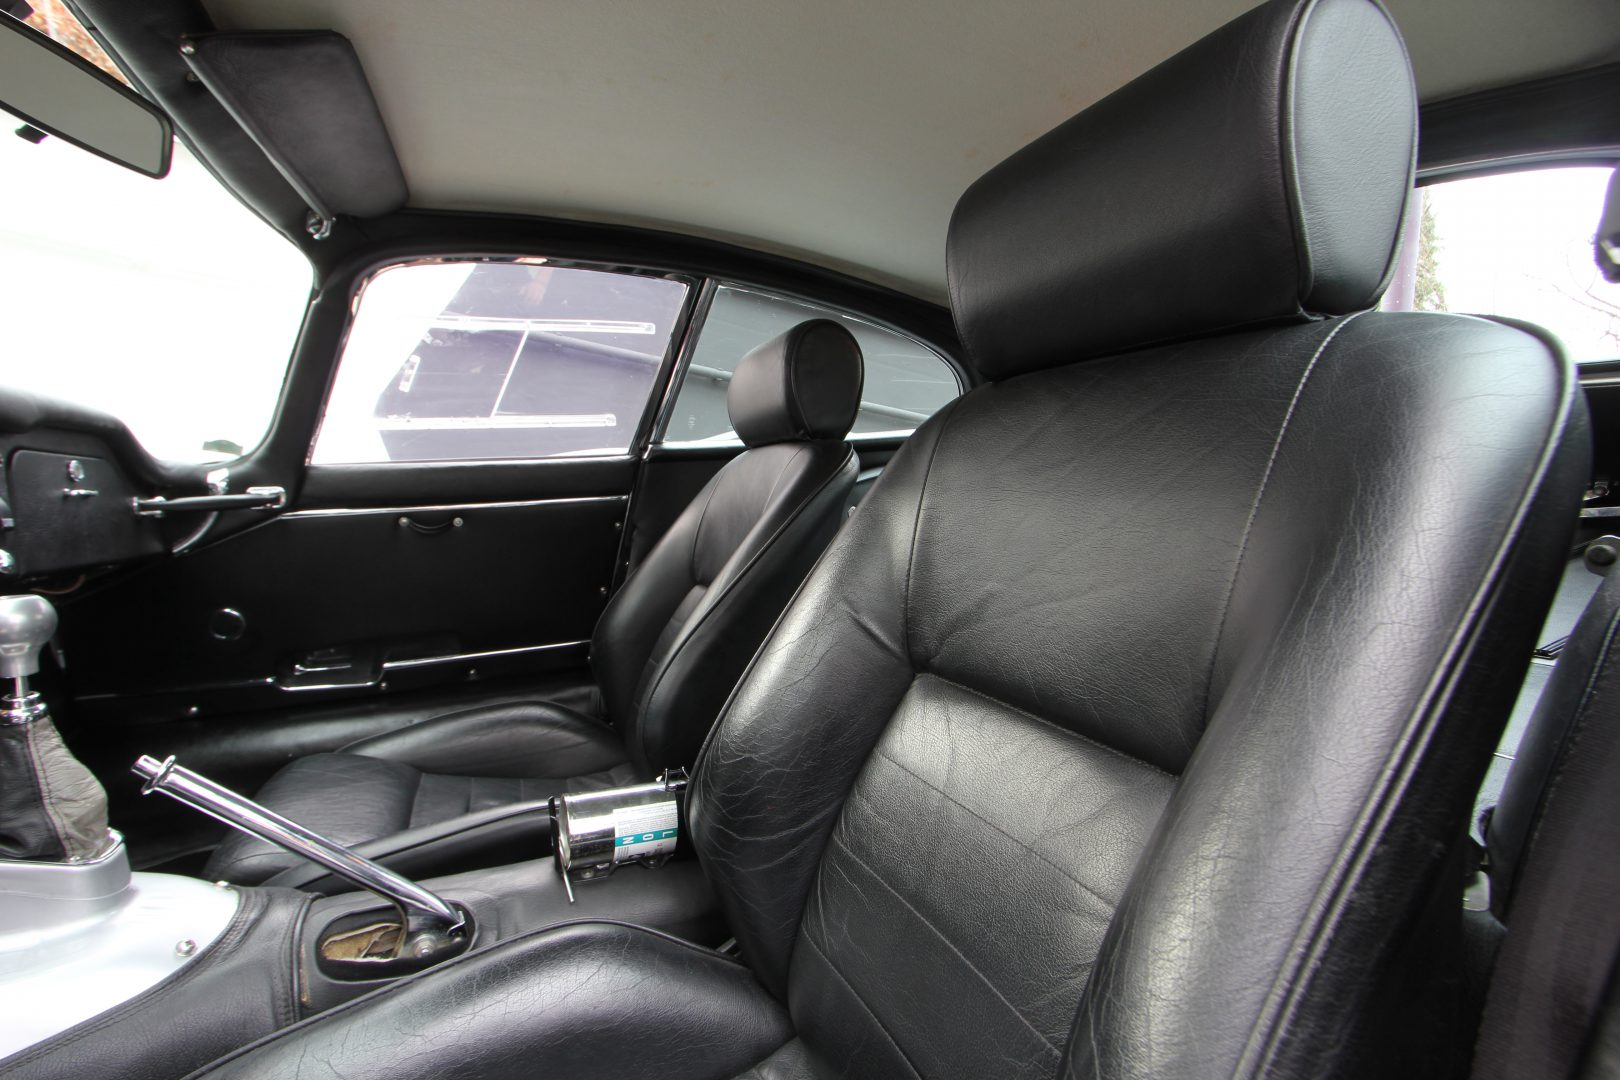 AIL Jaguar E-Type Coupé S1,5 Lightweight Recreation 3